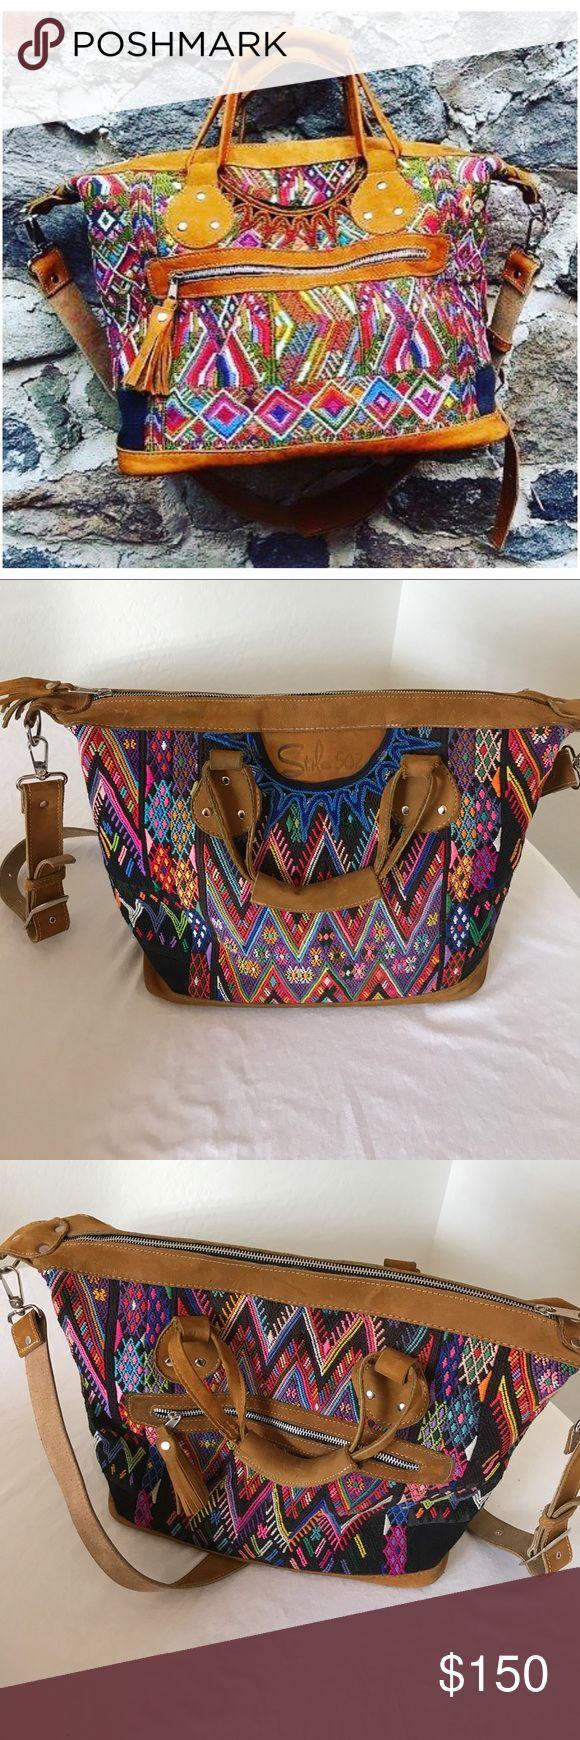 Selling this Stilo 502 handwoven, tribal, cross body tote on Poshmark! My username is: bohomamaaf. #shopmycloset #poshmark #fashion #shopping #style #forsale #stilo 52 #Handbags